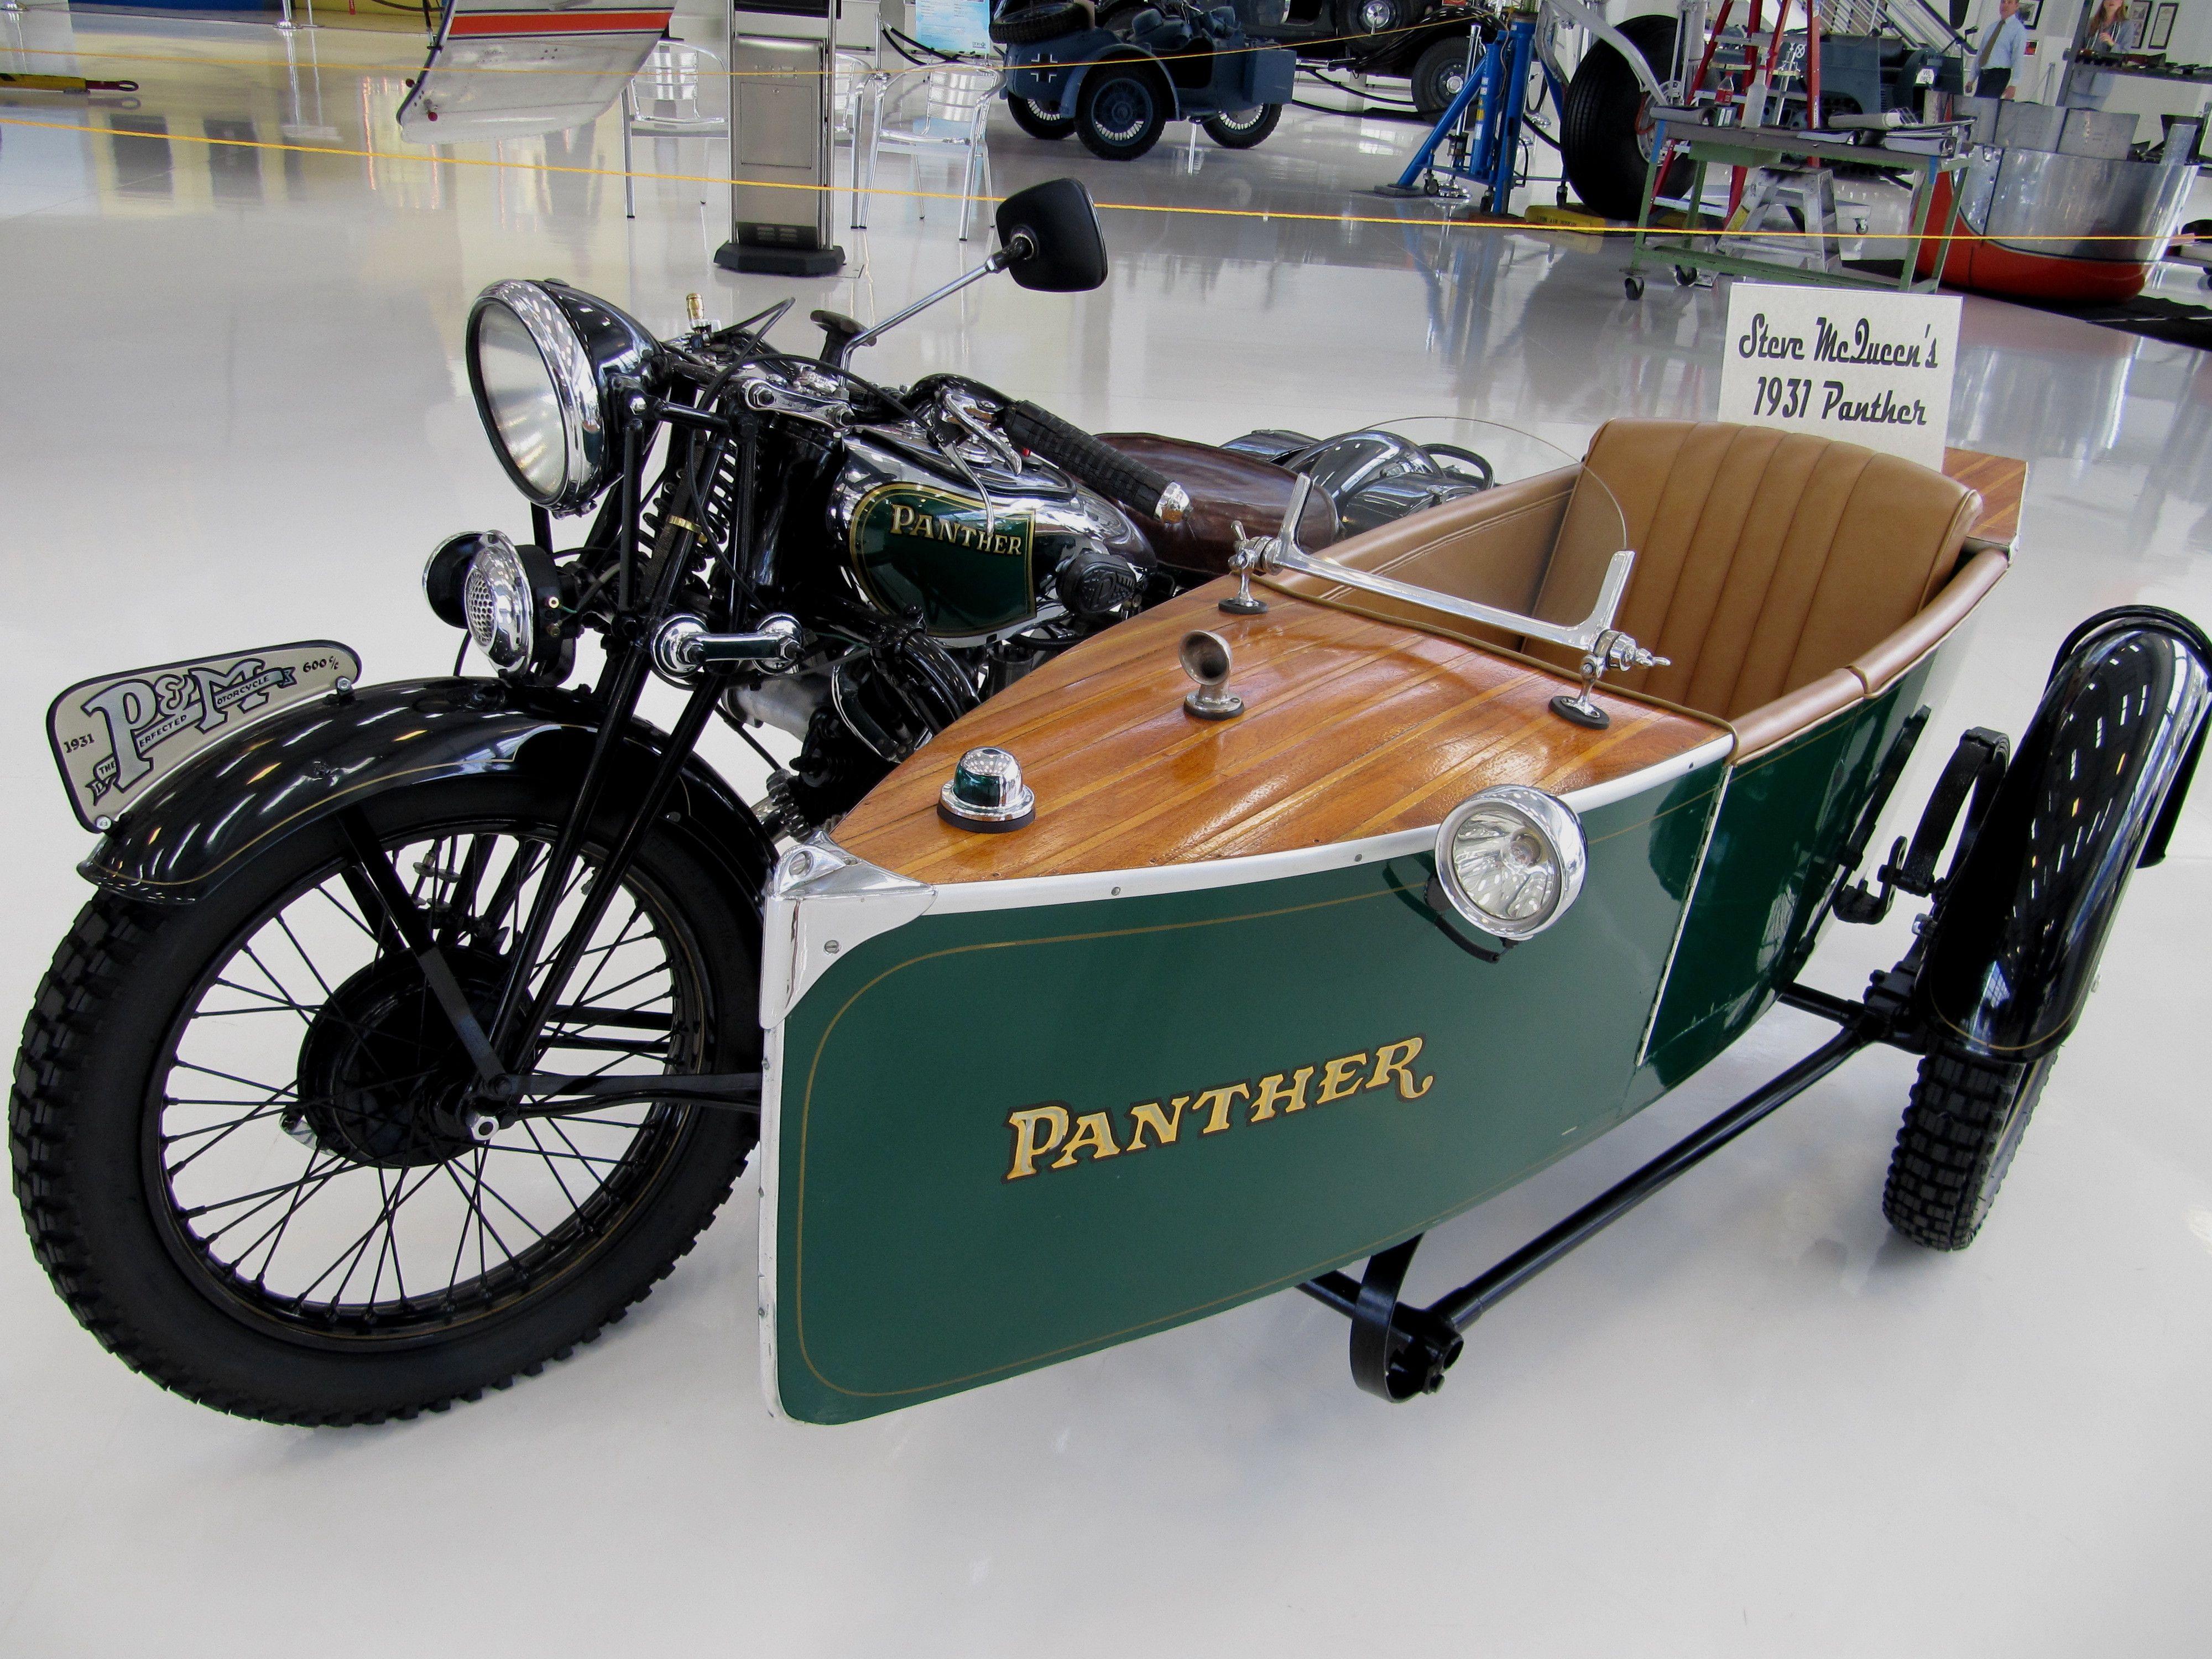 Panther Motorcycle 1931 Motorcycle Vintage Bikes Motorcycle Sidecar